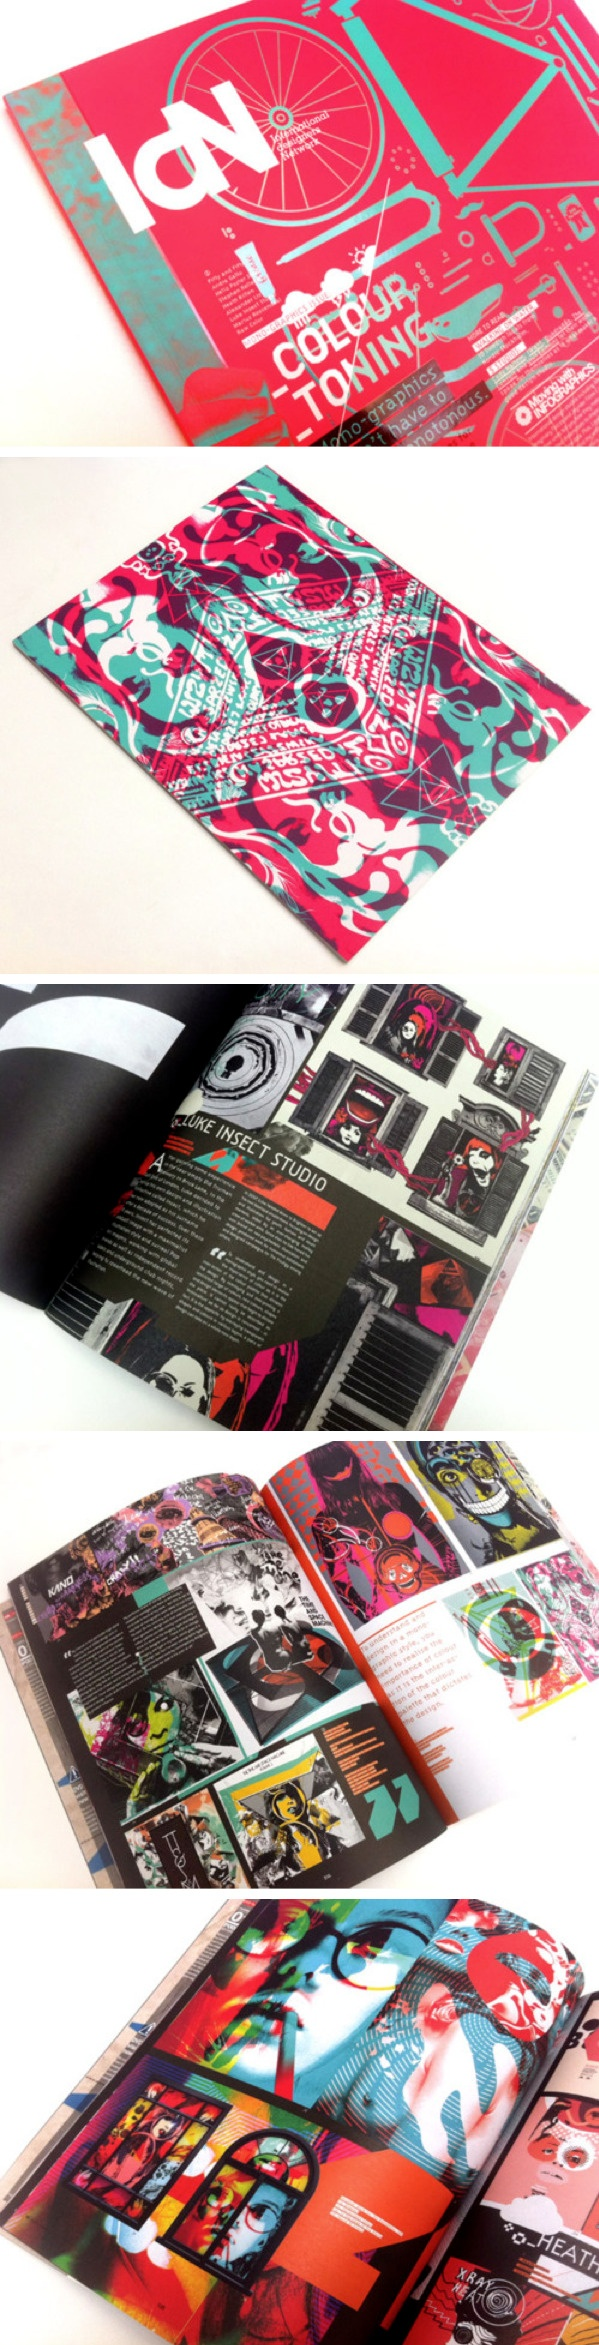 IdN Magazine Vol 18 No 4